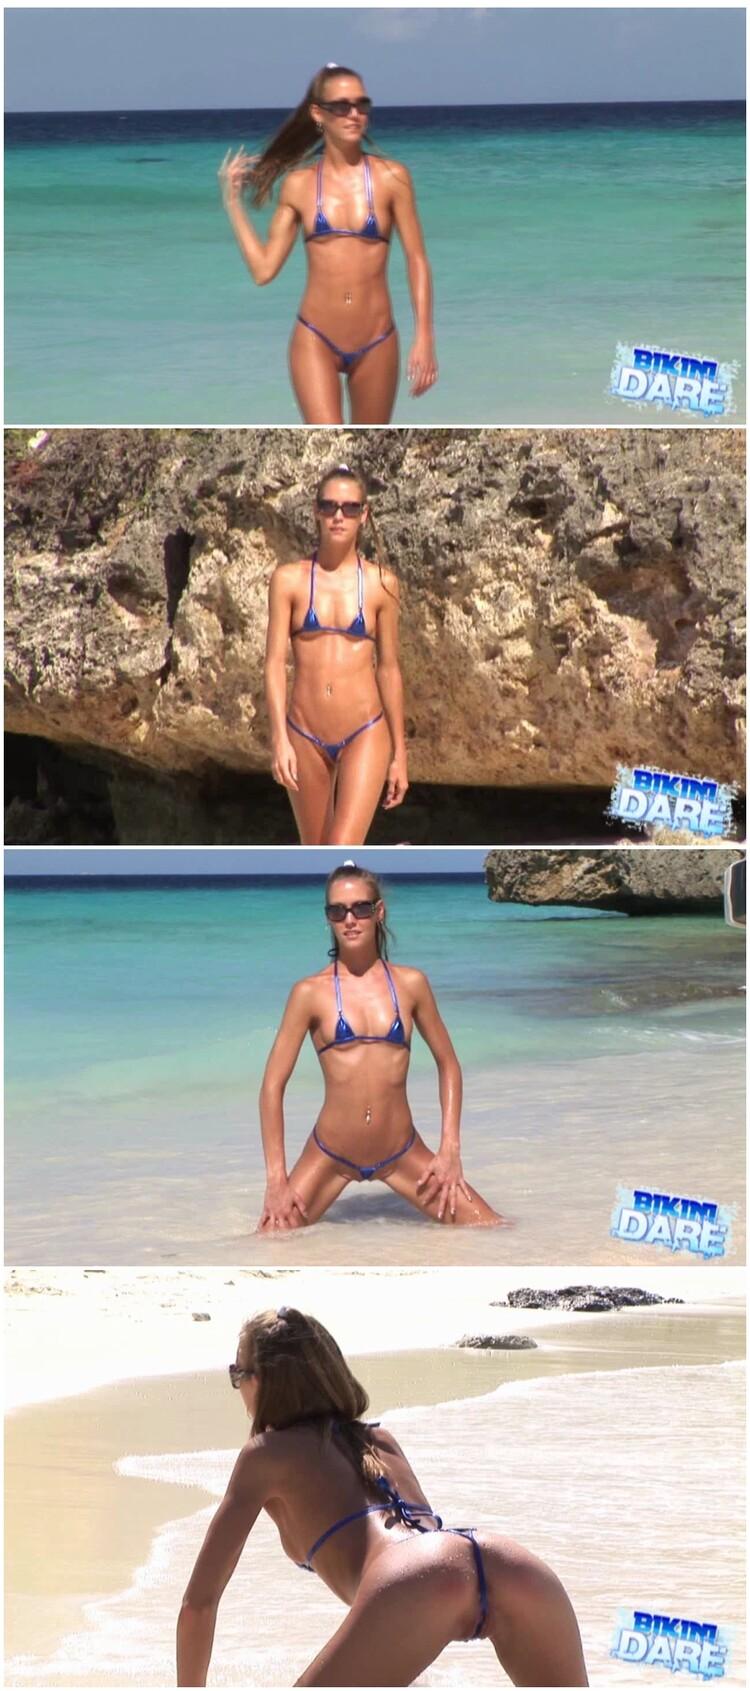 bikini-dare041_cover_l.jpg